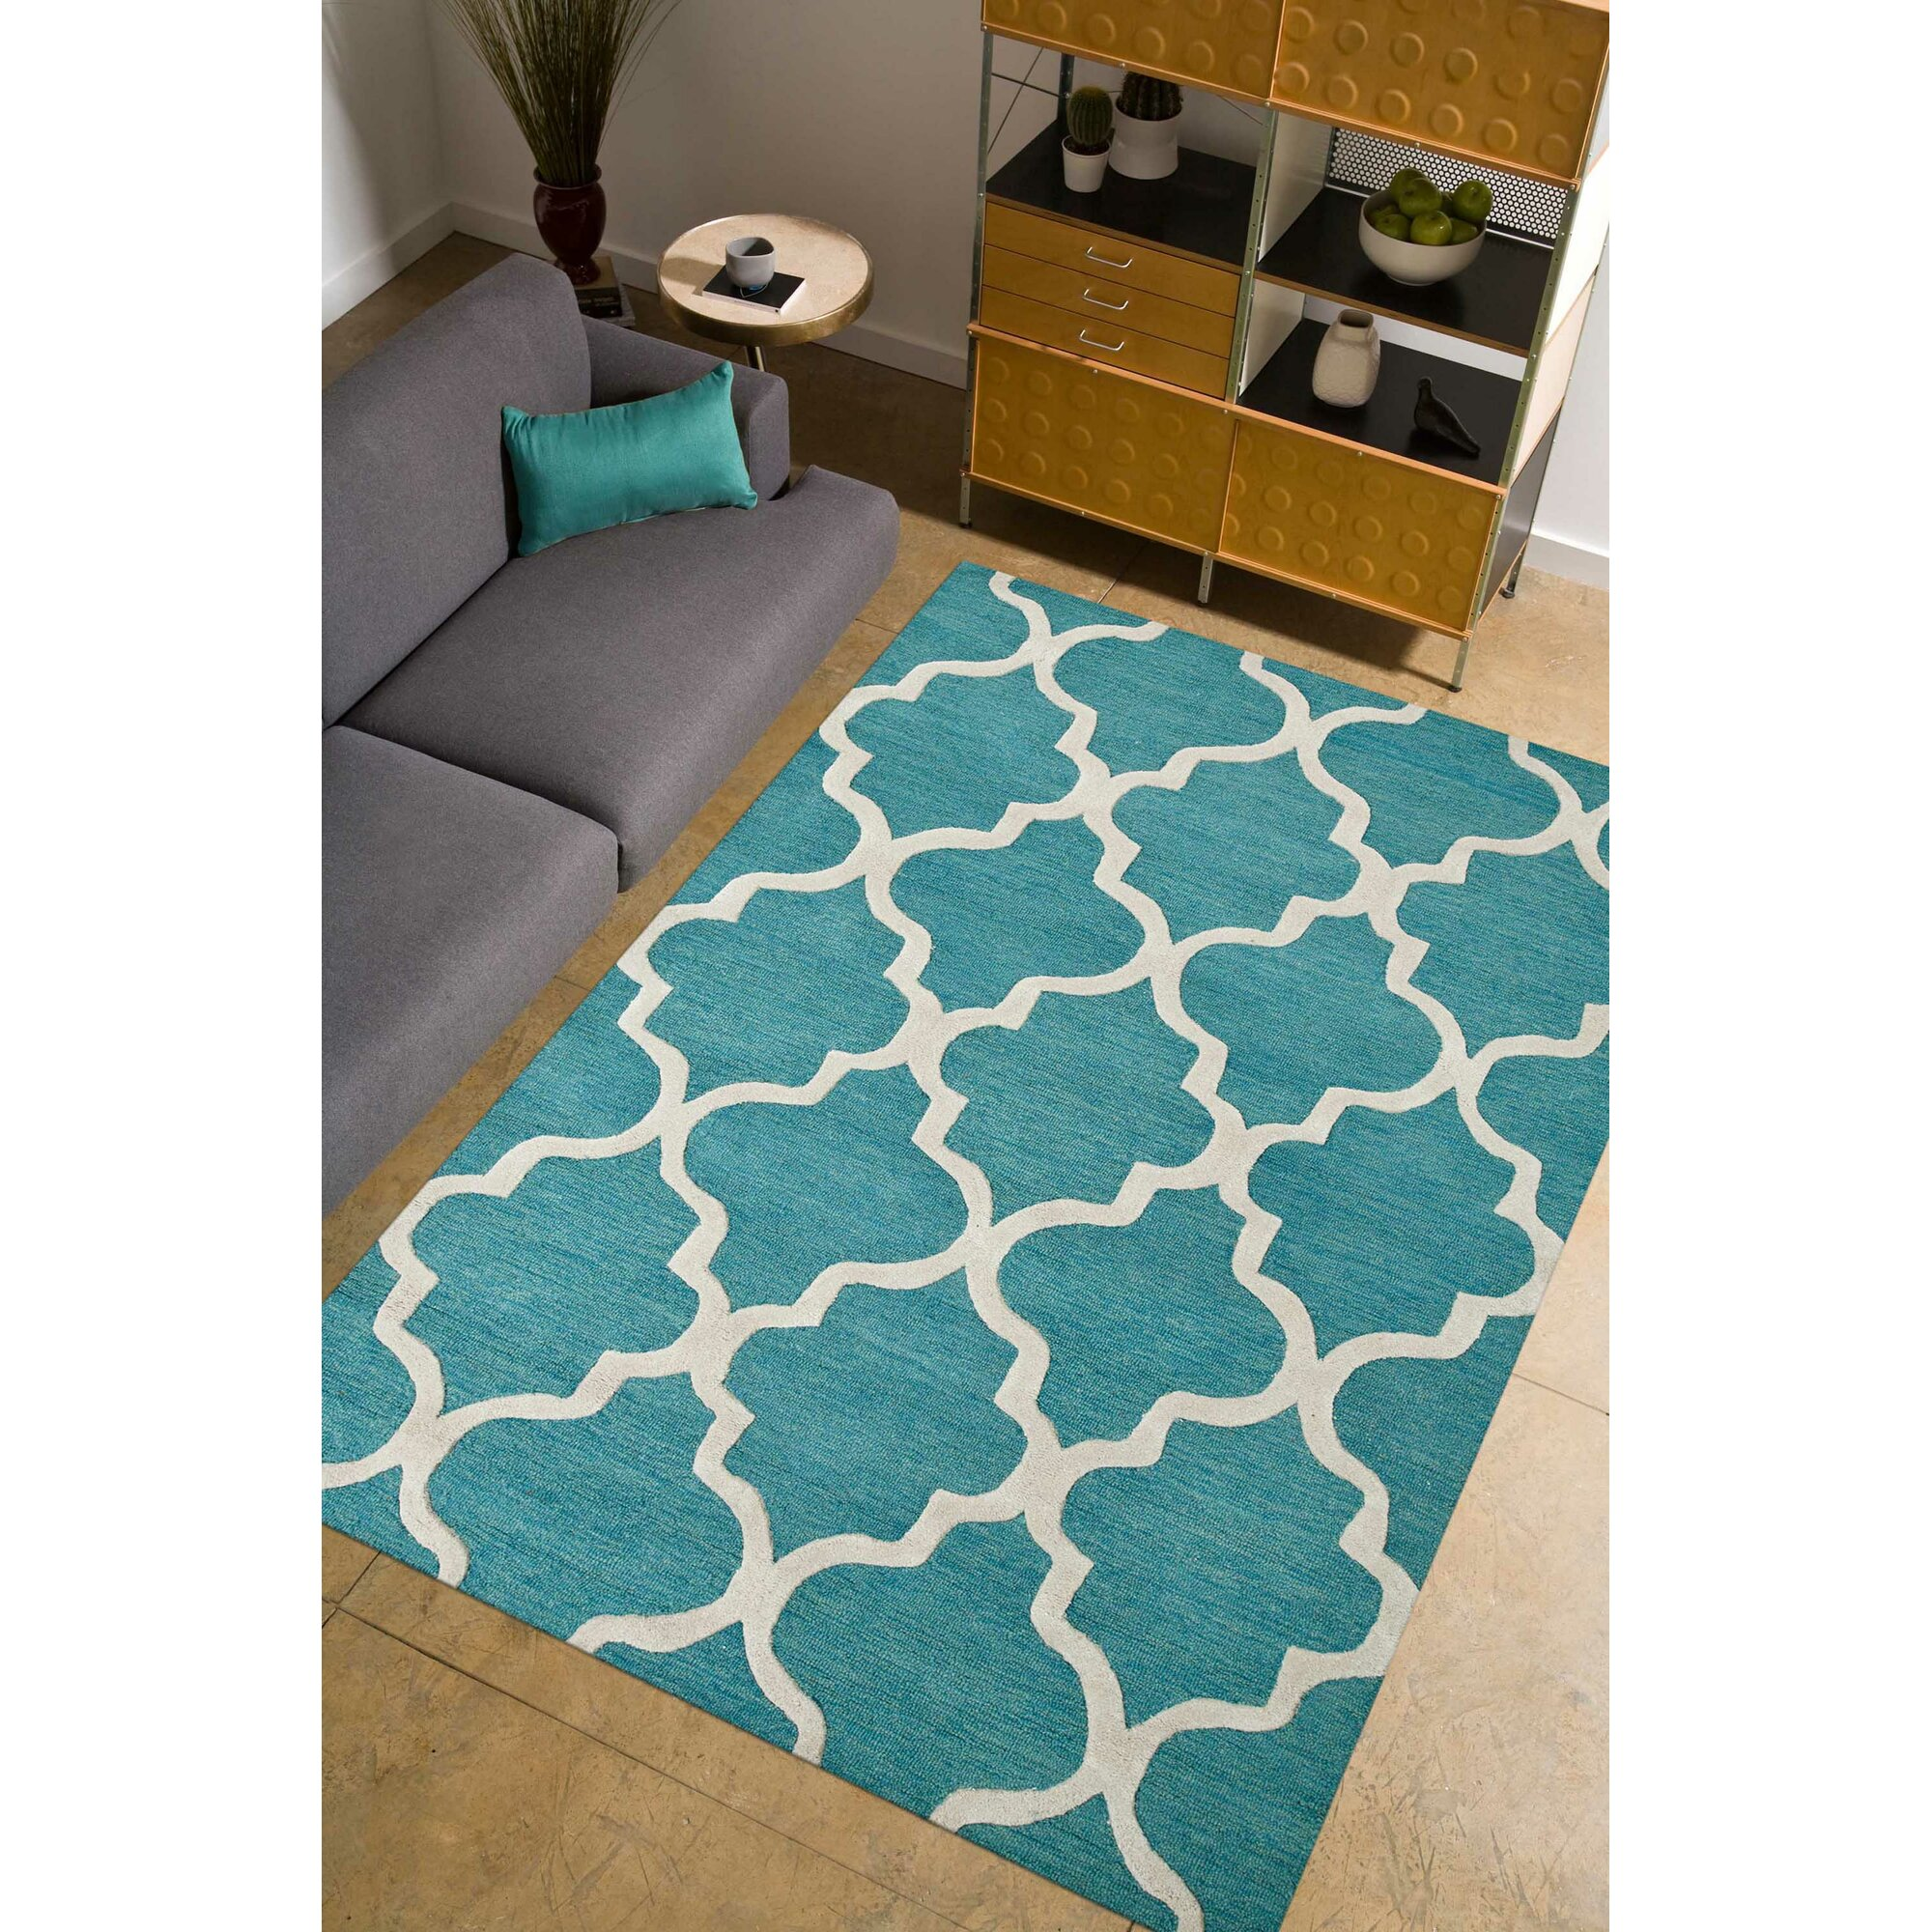 parwis handgetufteter teppich miami in hellblau. Black Bedroom Furniture Sets. Home Design Ideas